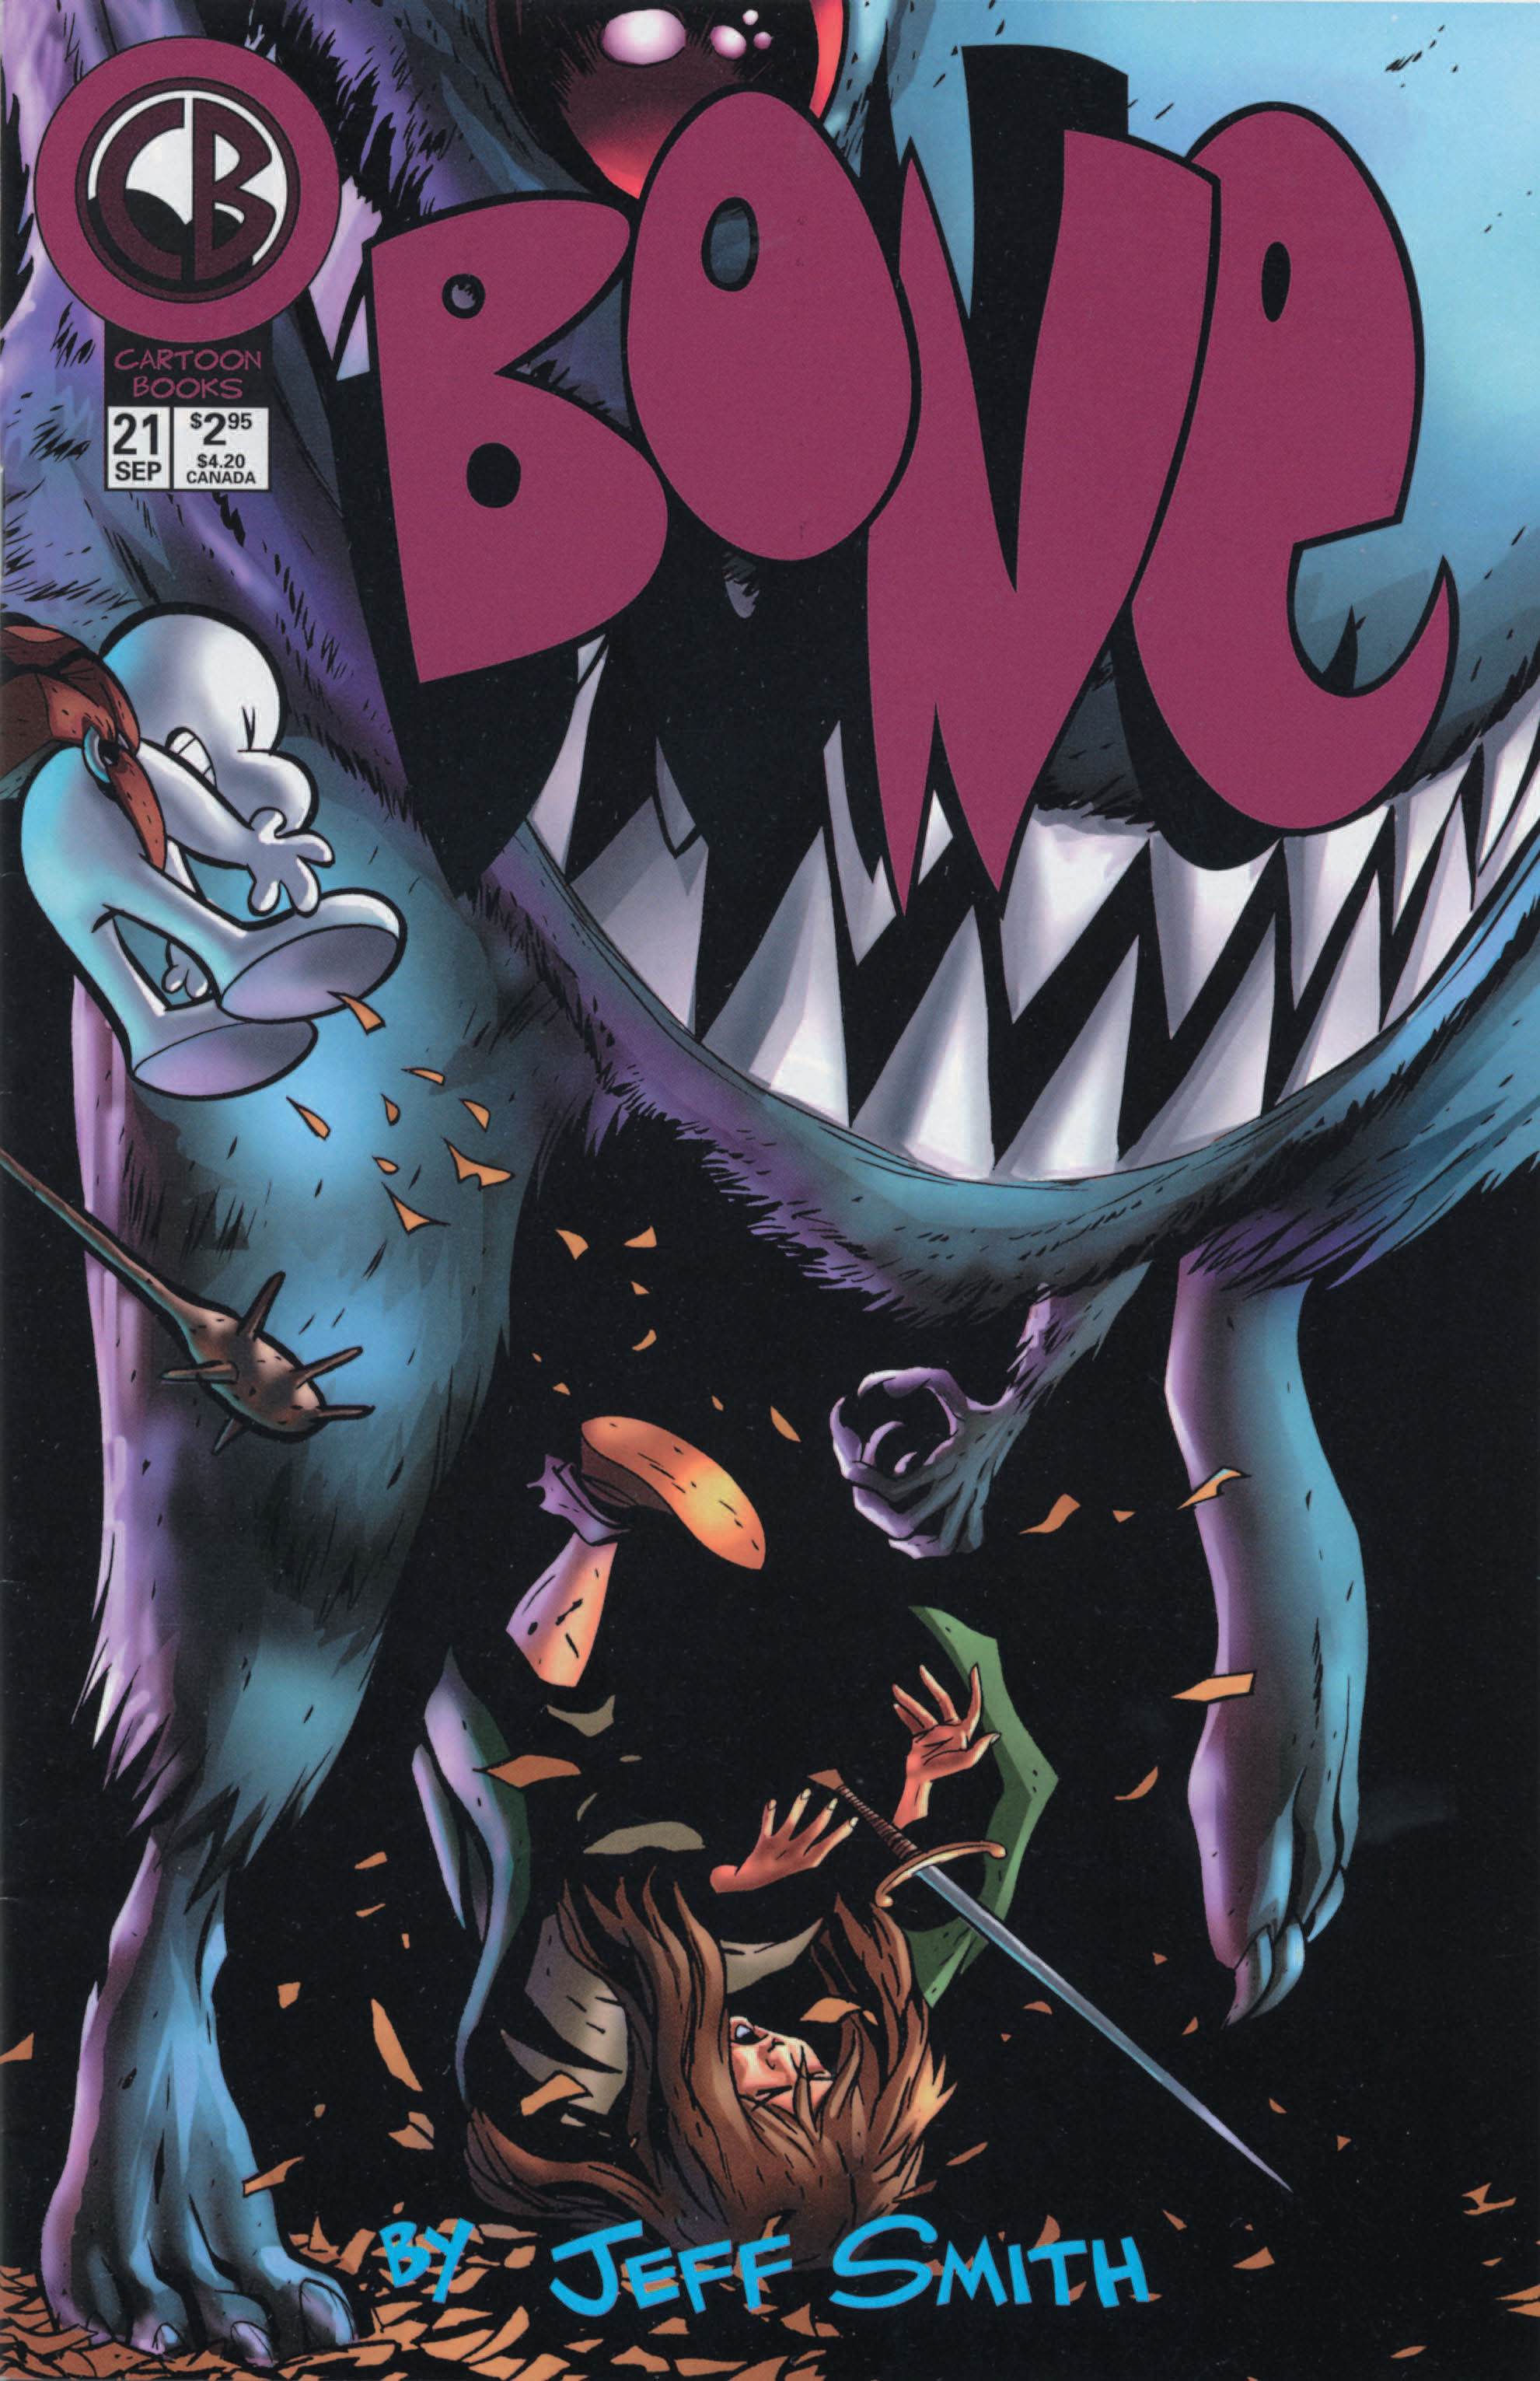 Bone 1991 Issue 21